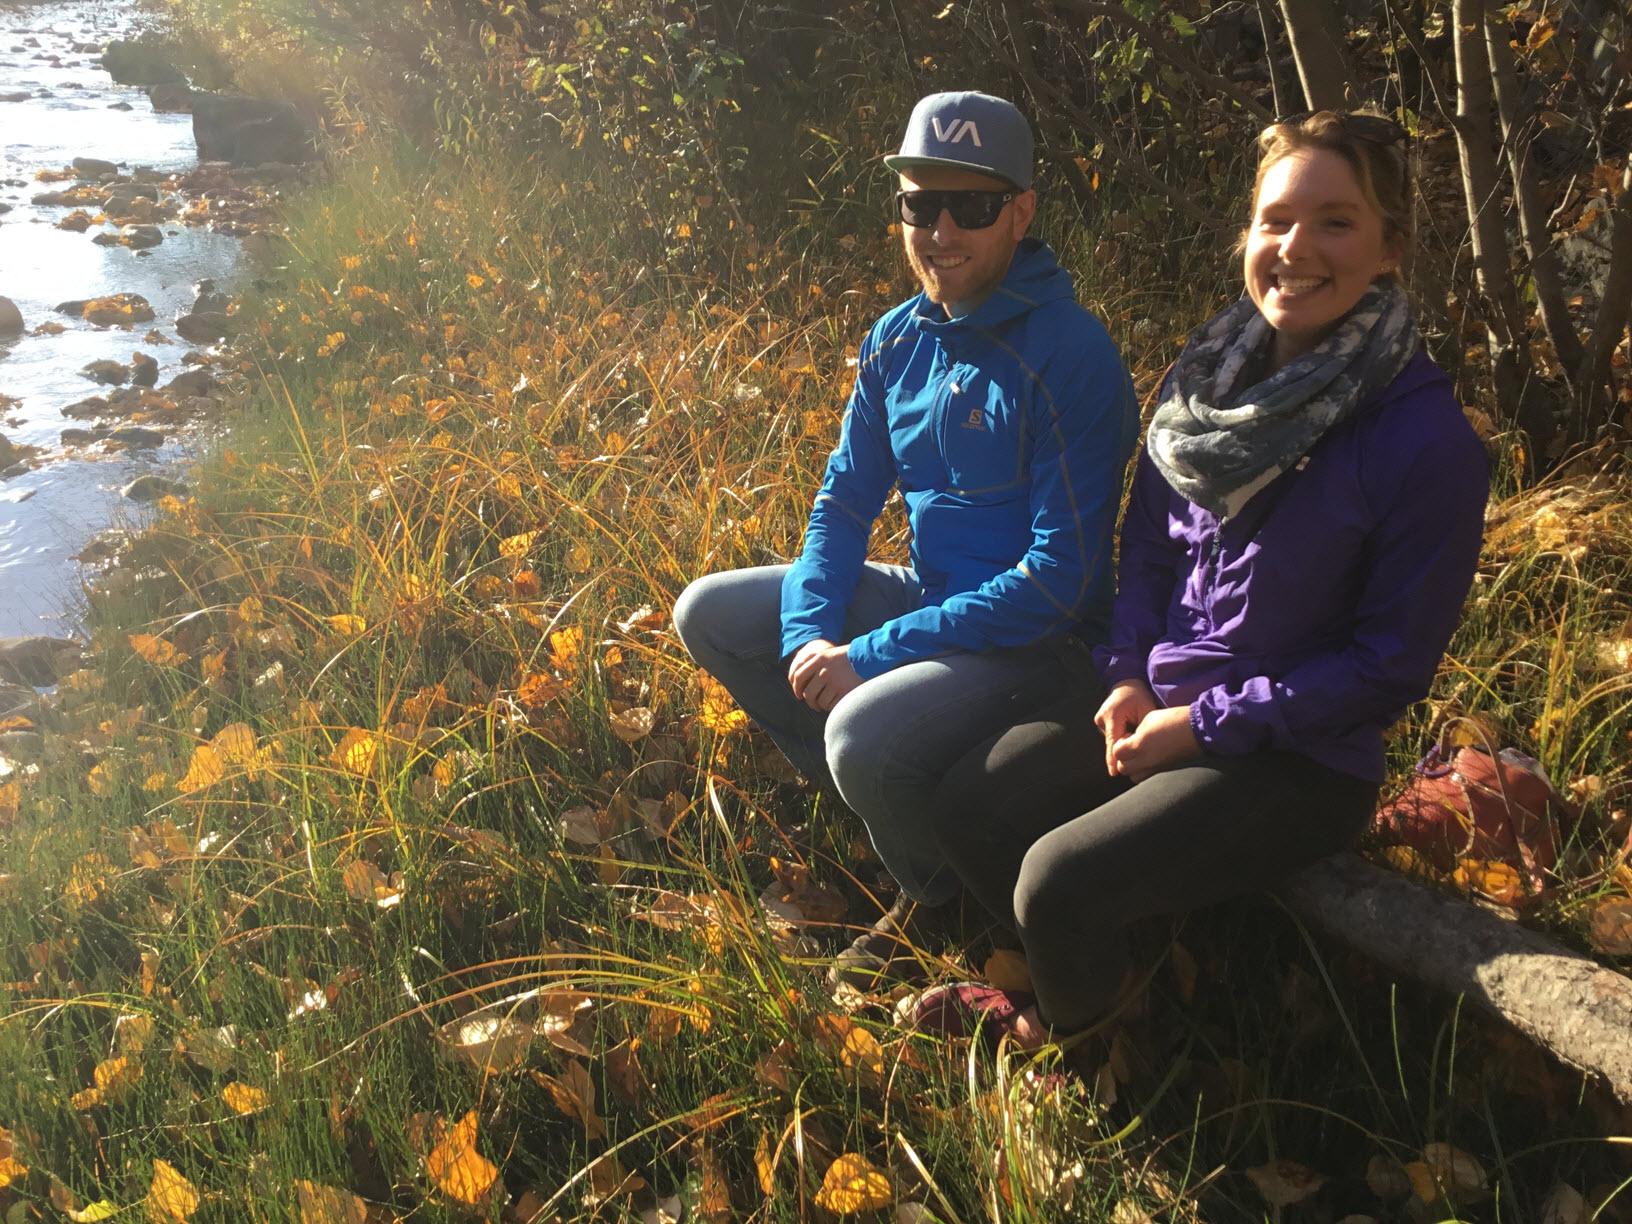 Greg Kilroy and Bryana van Leeuwen, Telemark Nordic Masters Program Head Coaches